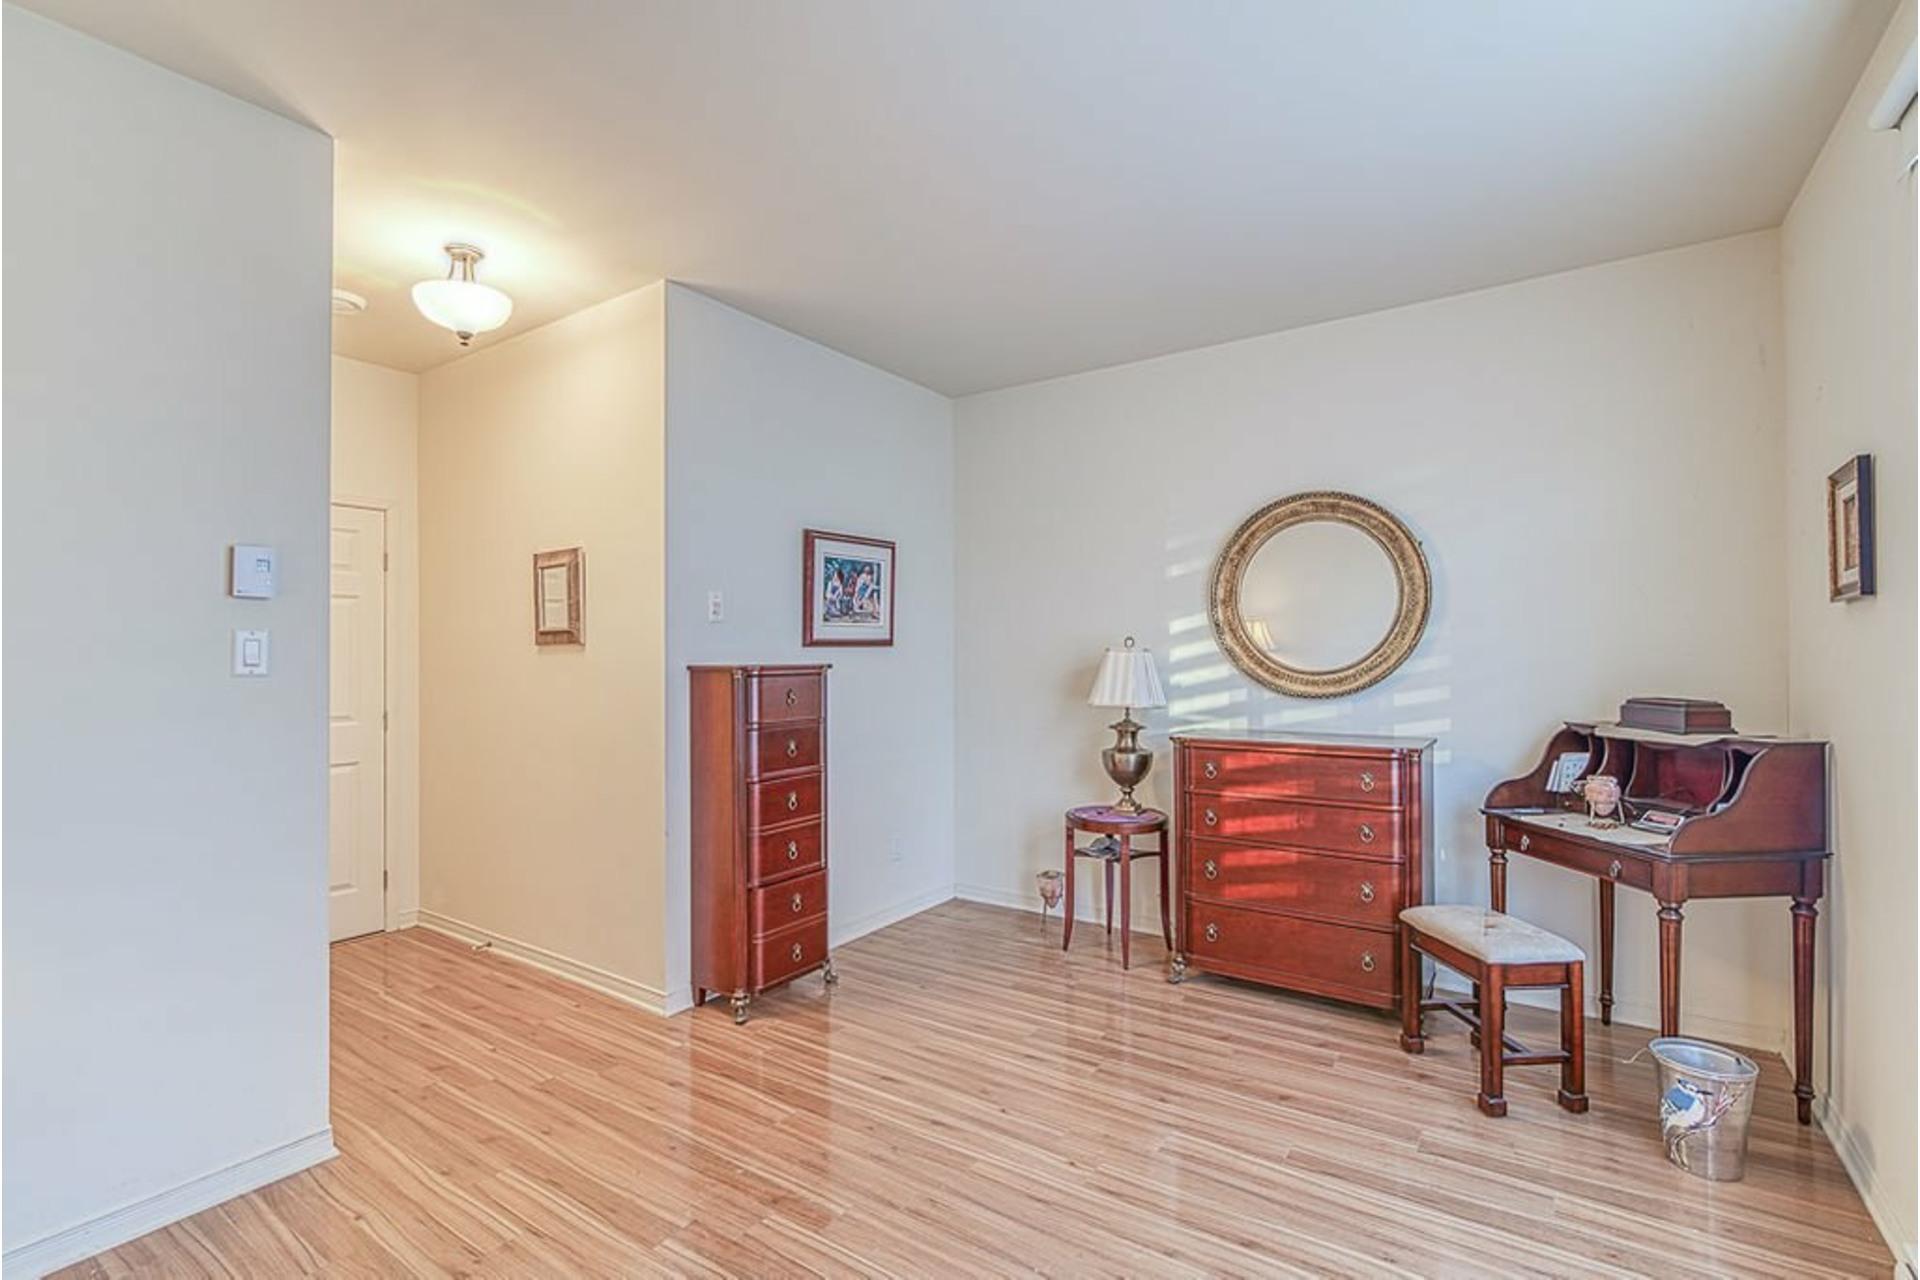 image 17 - Apartment For sale Le Vieux-Longueuil Longueuil  - 7 rooms